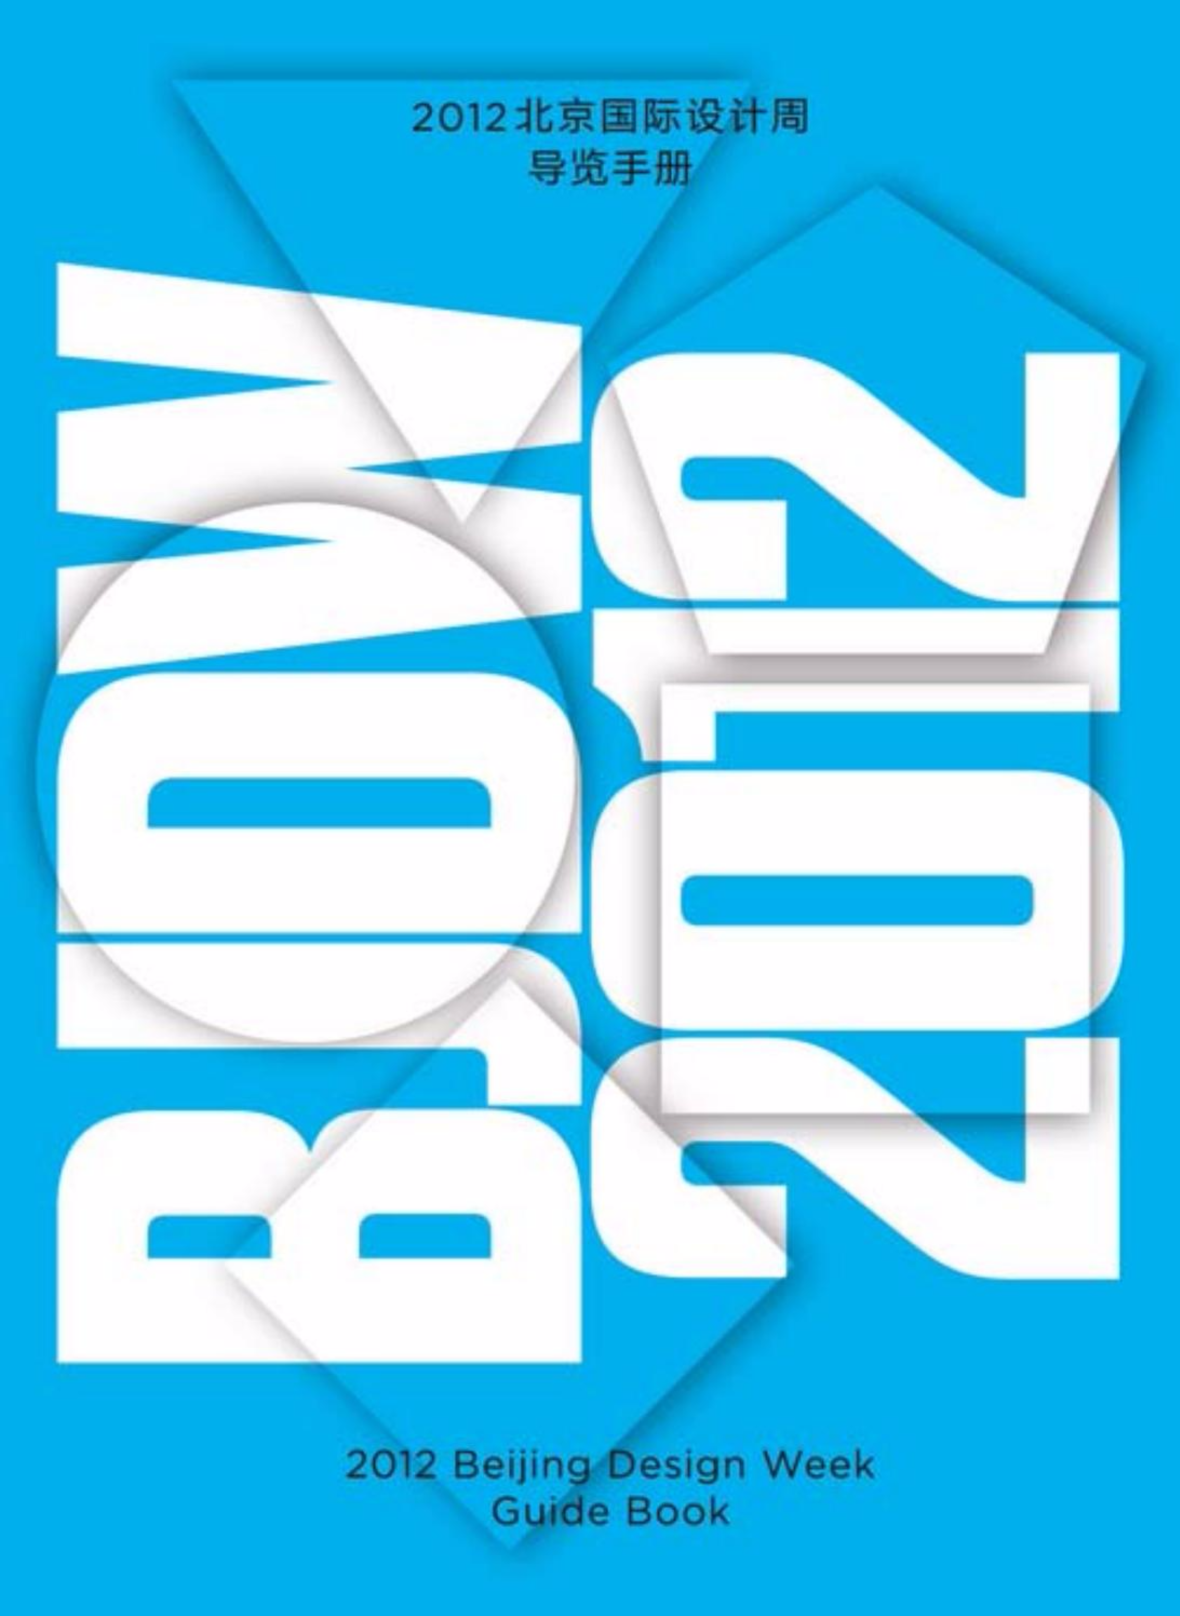 2012 bjdw, Beijing Design Week 2012